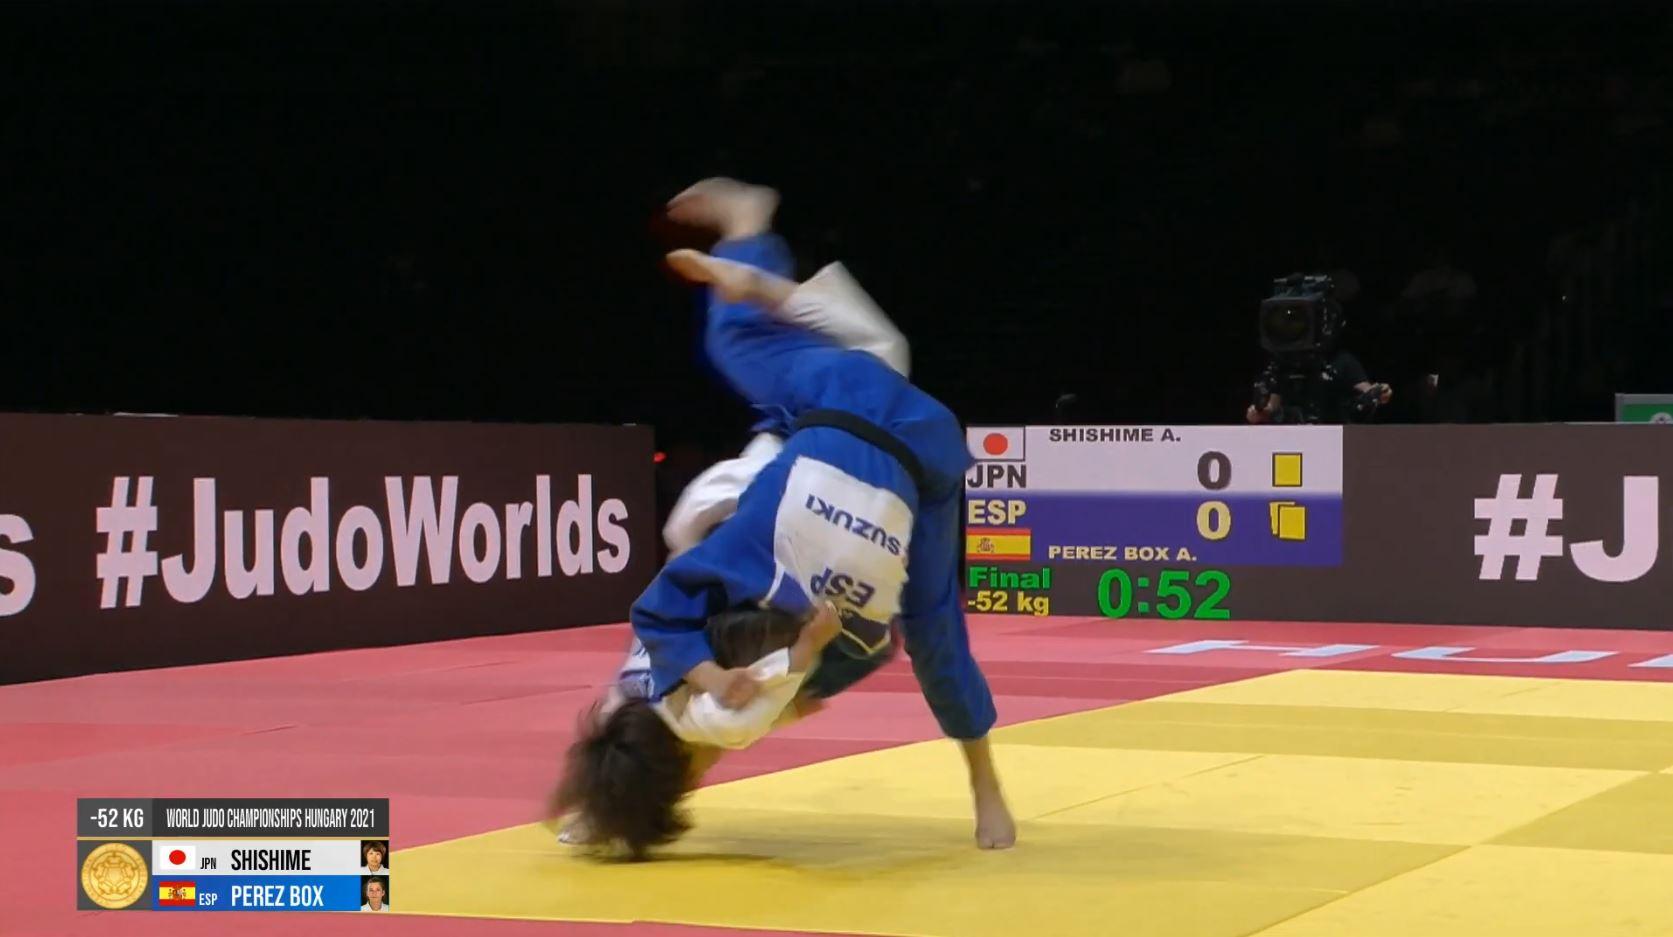 2021 World's Gold Medalists (Women)